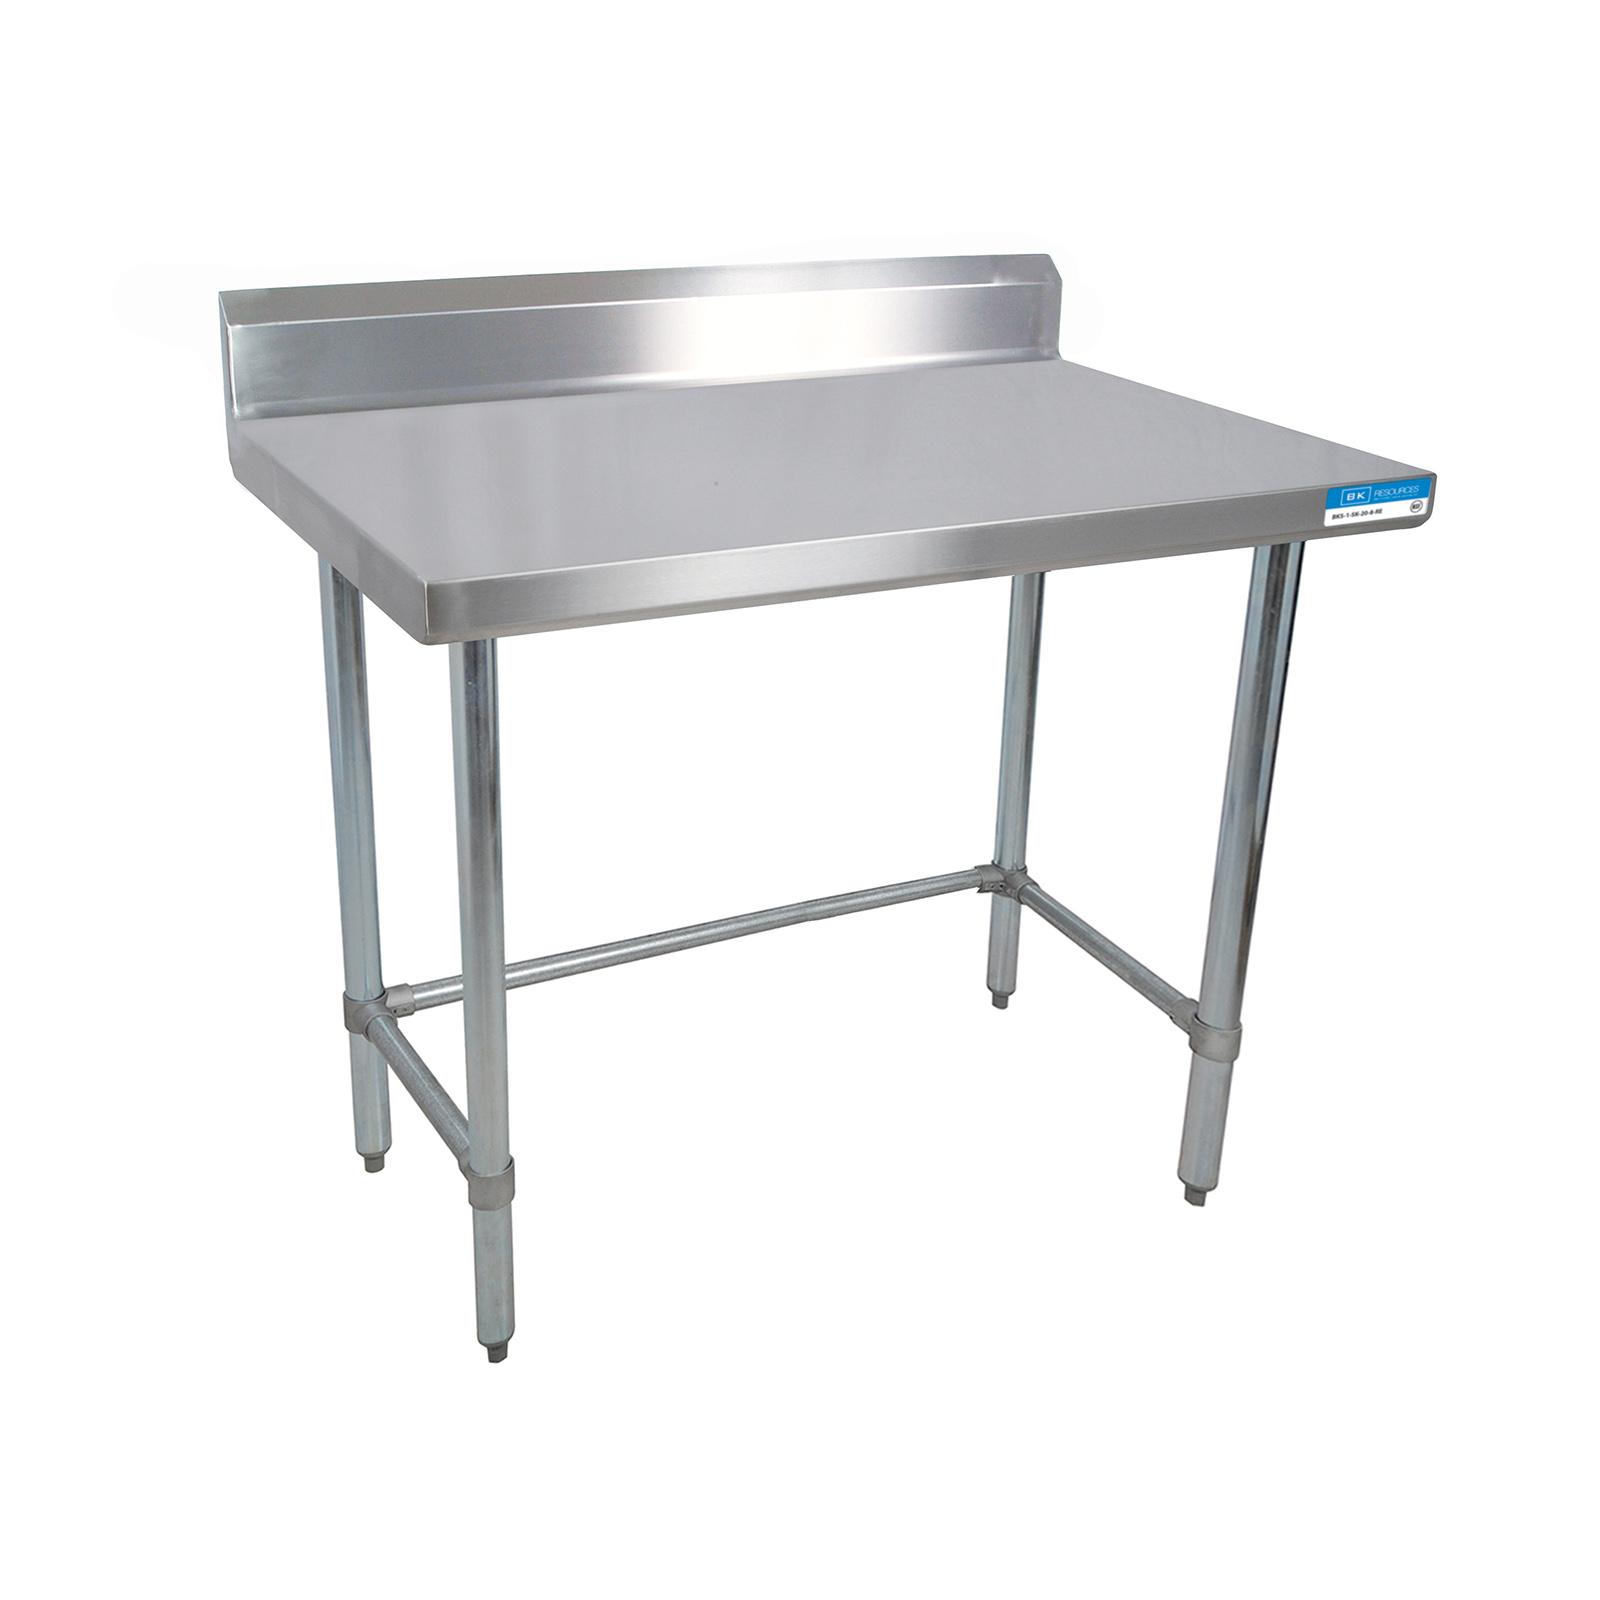 BK Resources SVTR5OB-8424 work table,  73